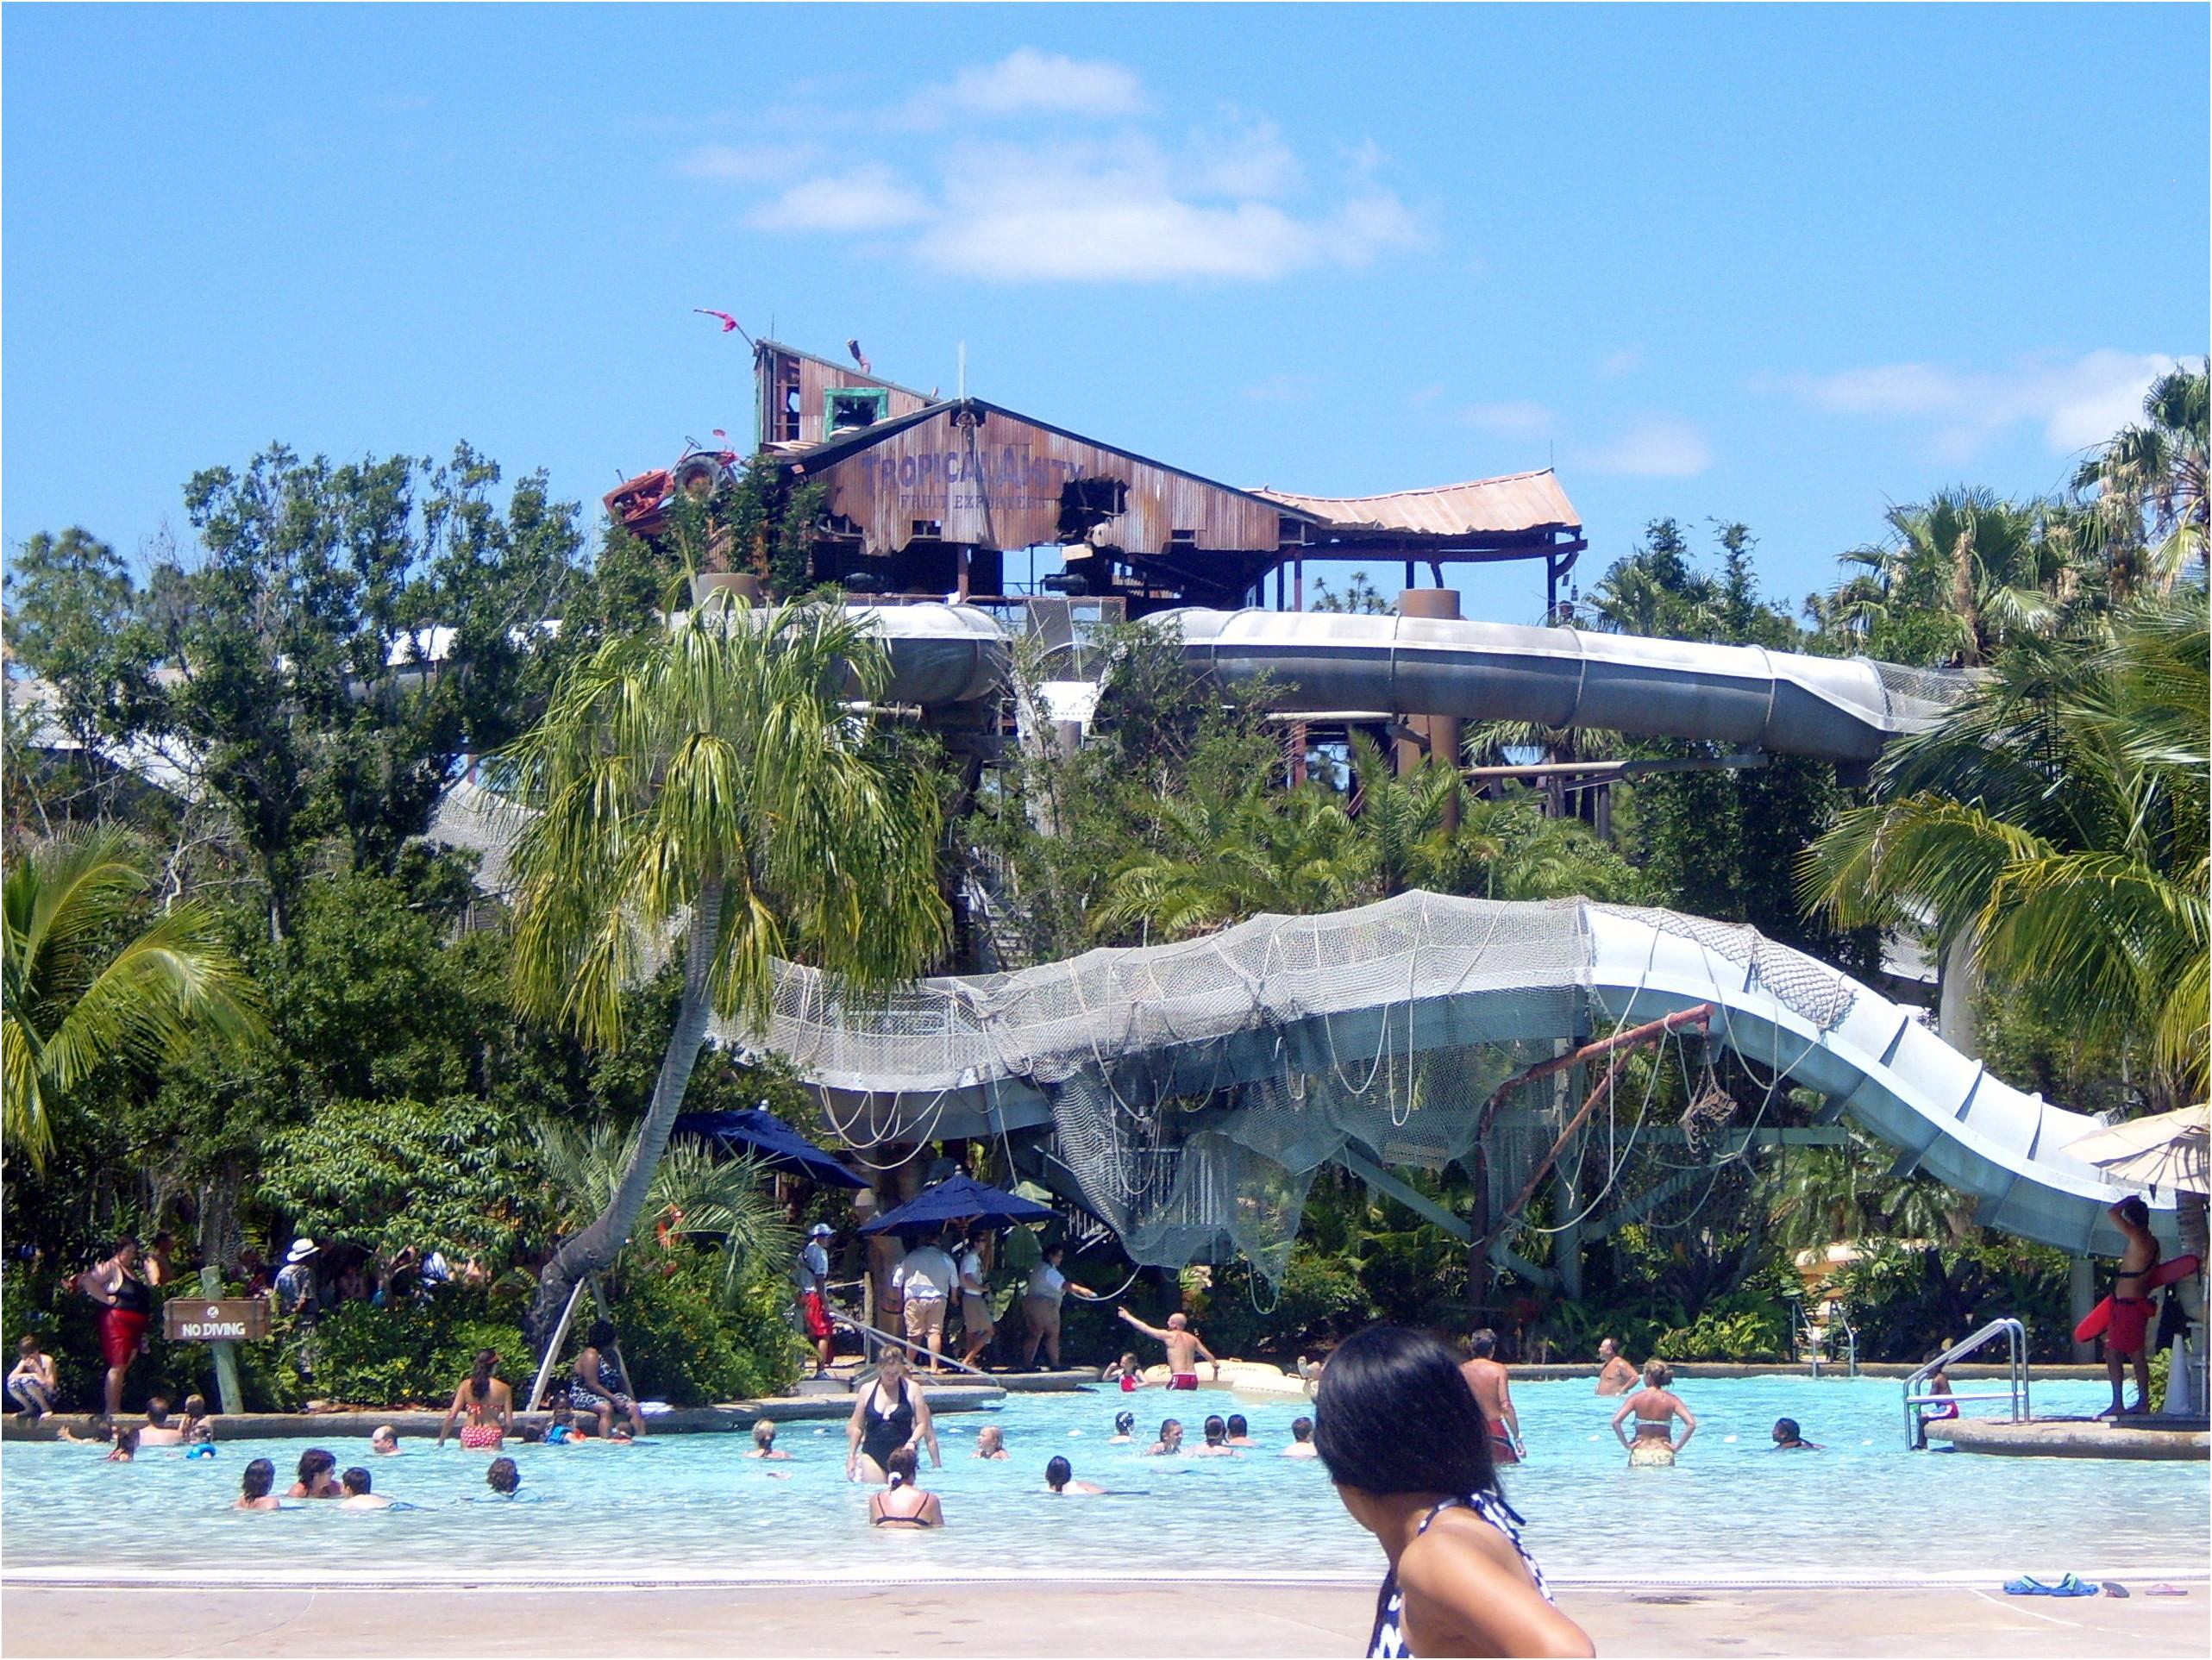 Lime Garage Disney Springs Awesome Walt Disney World Disney Springs – Travel Guide at Wikivoyage